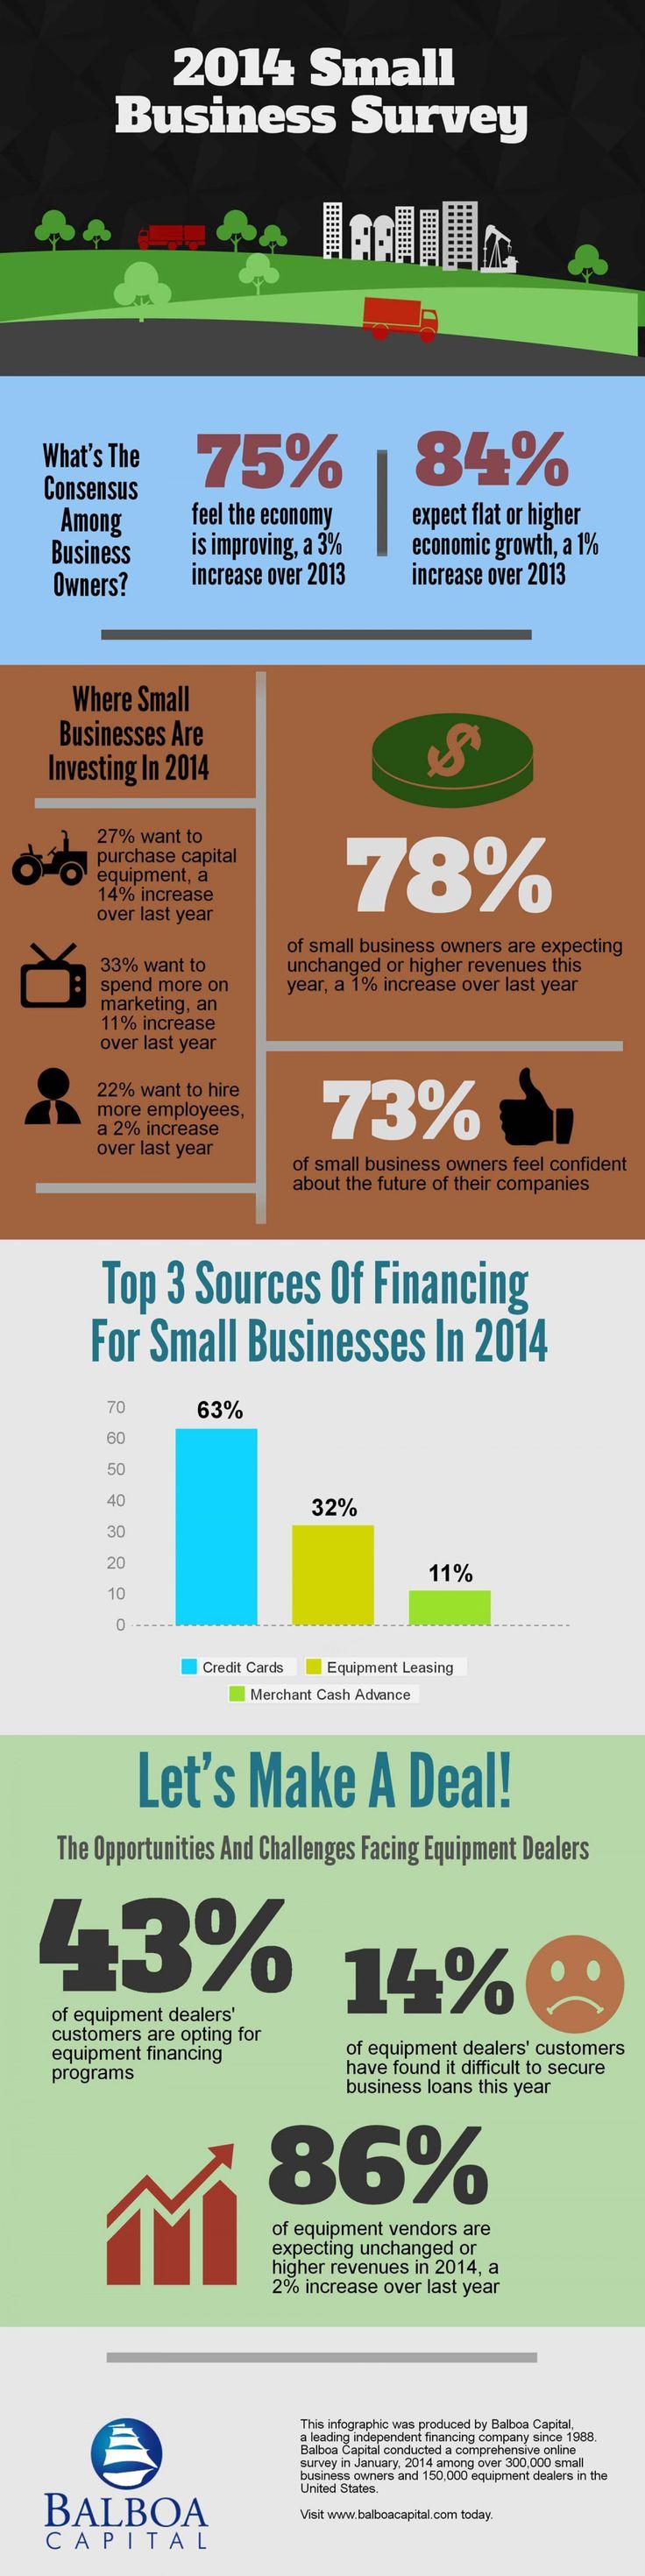 12 best Business Loans images on Pinterest | Business, Cash ...